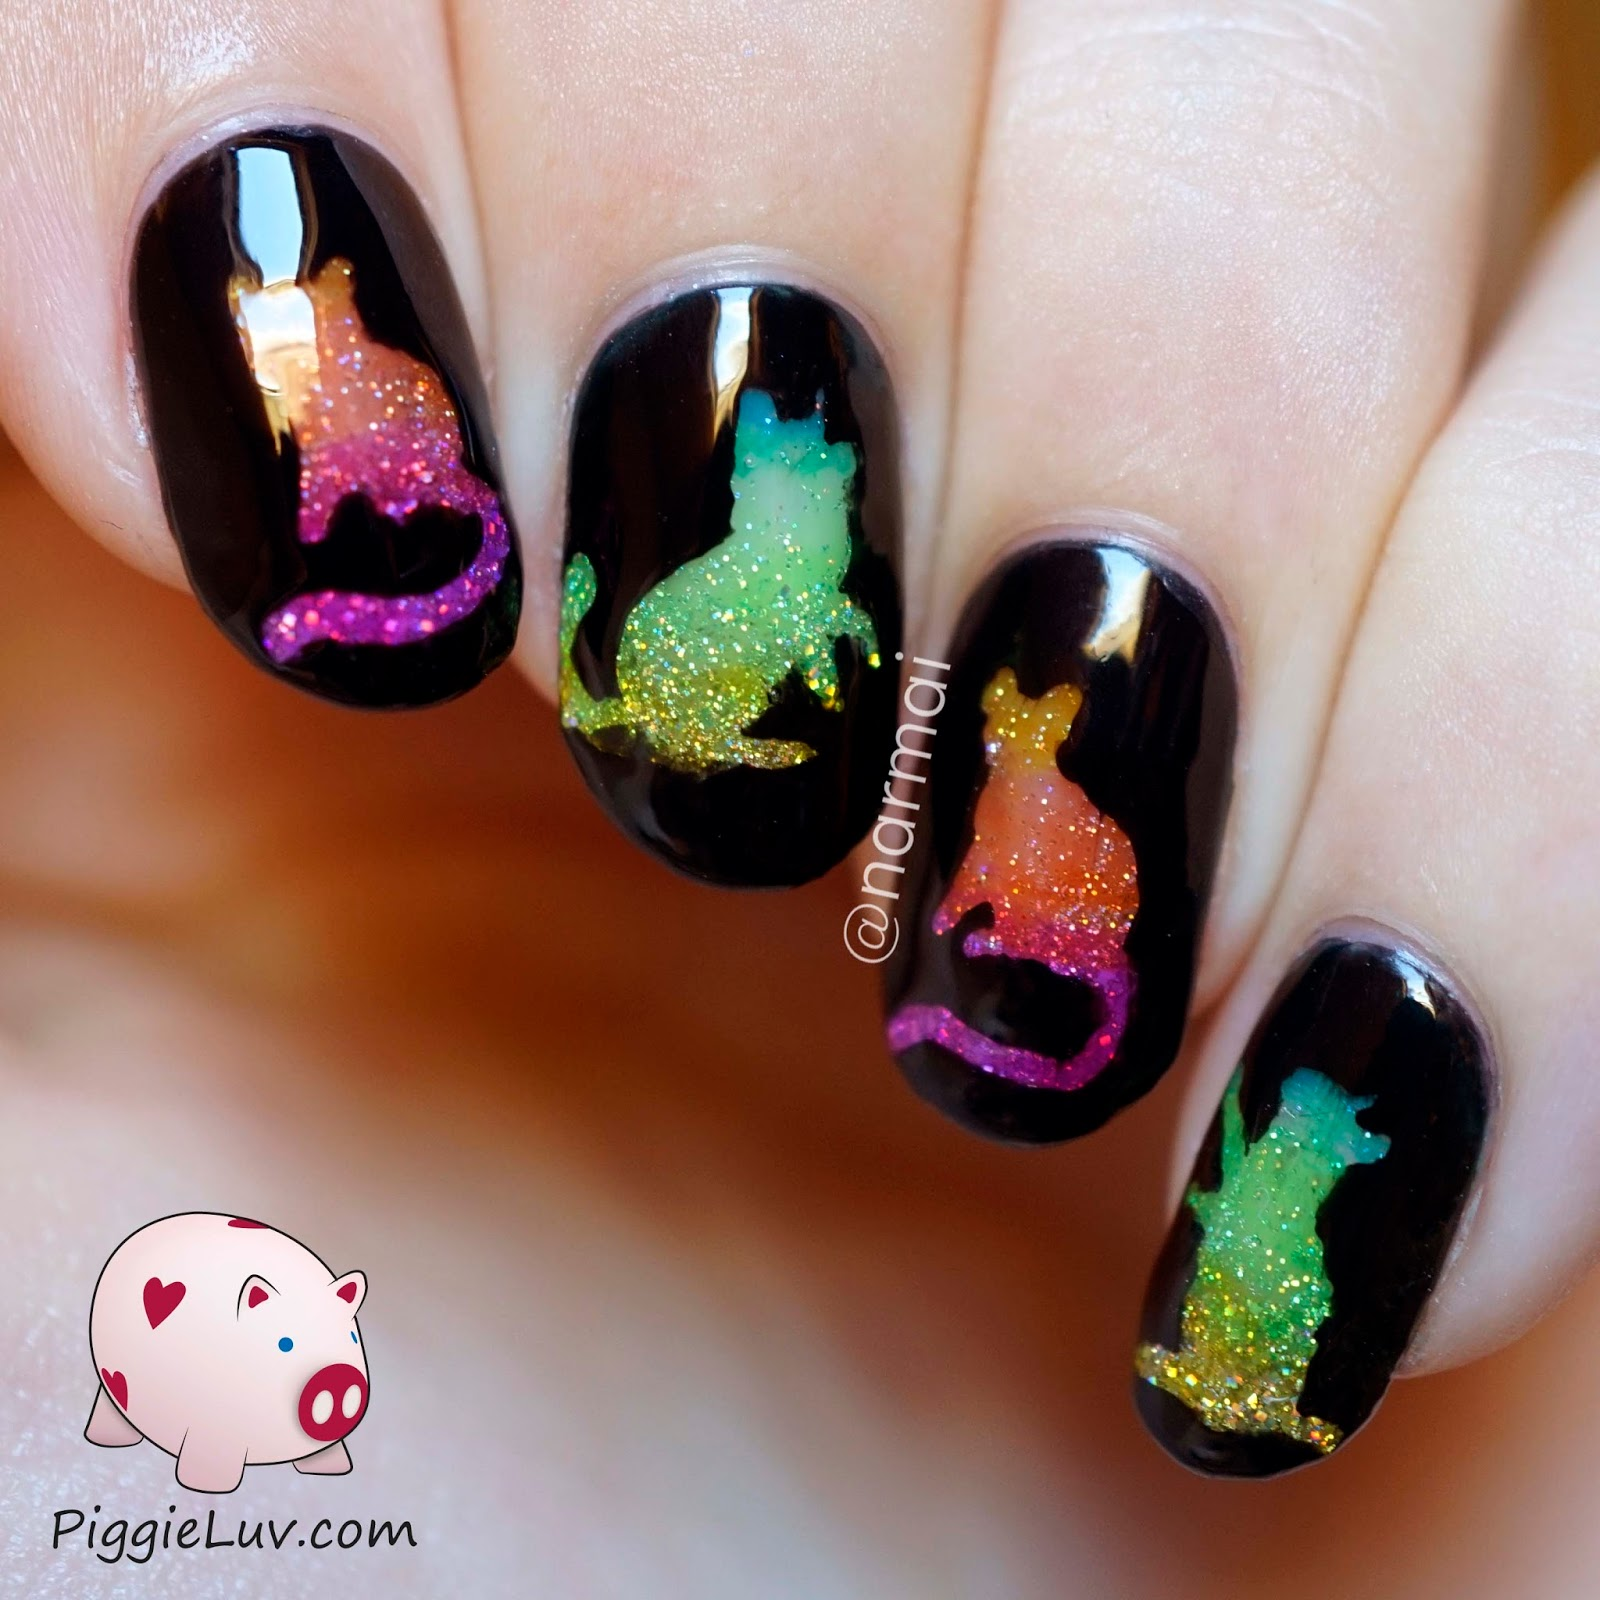 Piggieluv Rainbow Bubbles Nail Art: 20 Purrfect Nail Art Ideas For The Proud Cat Lady